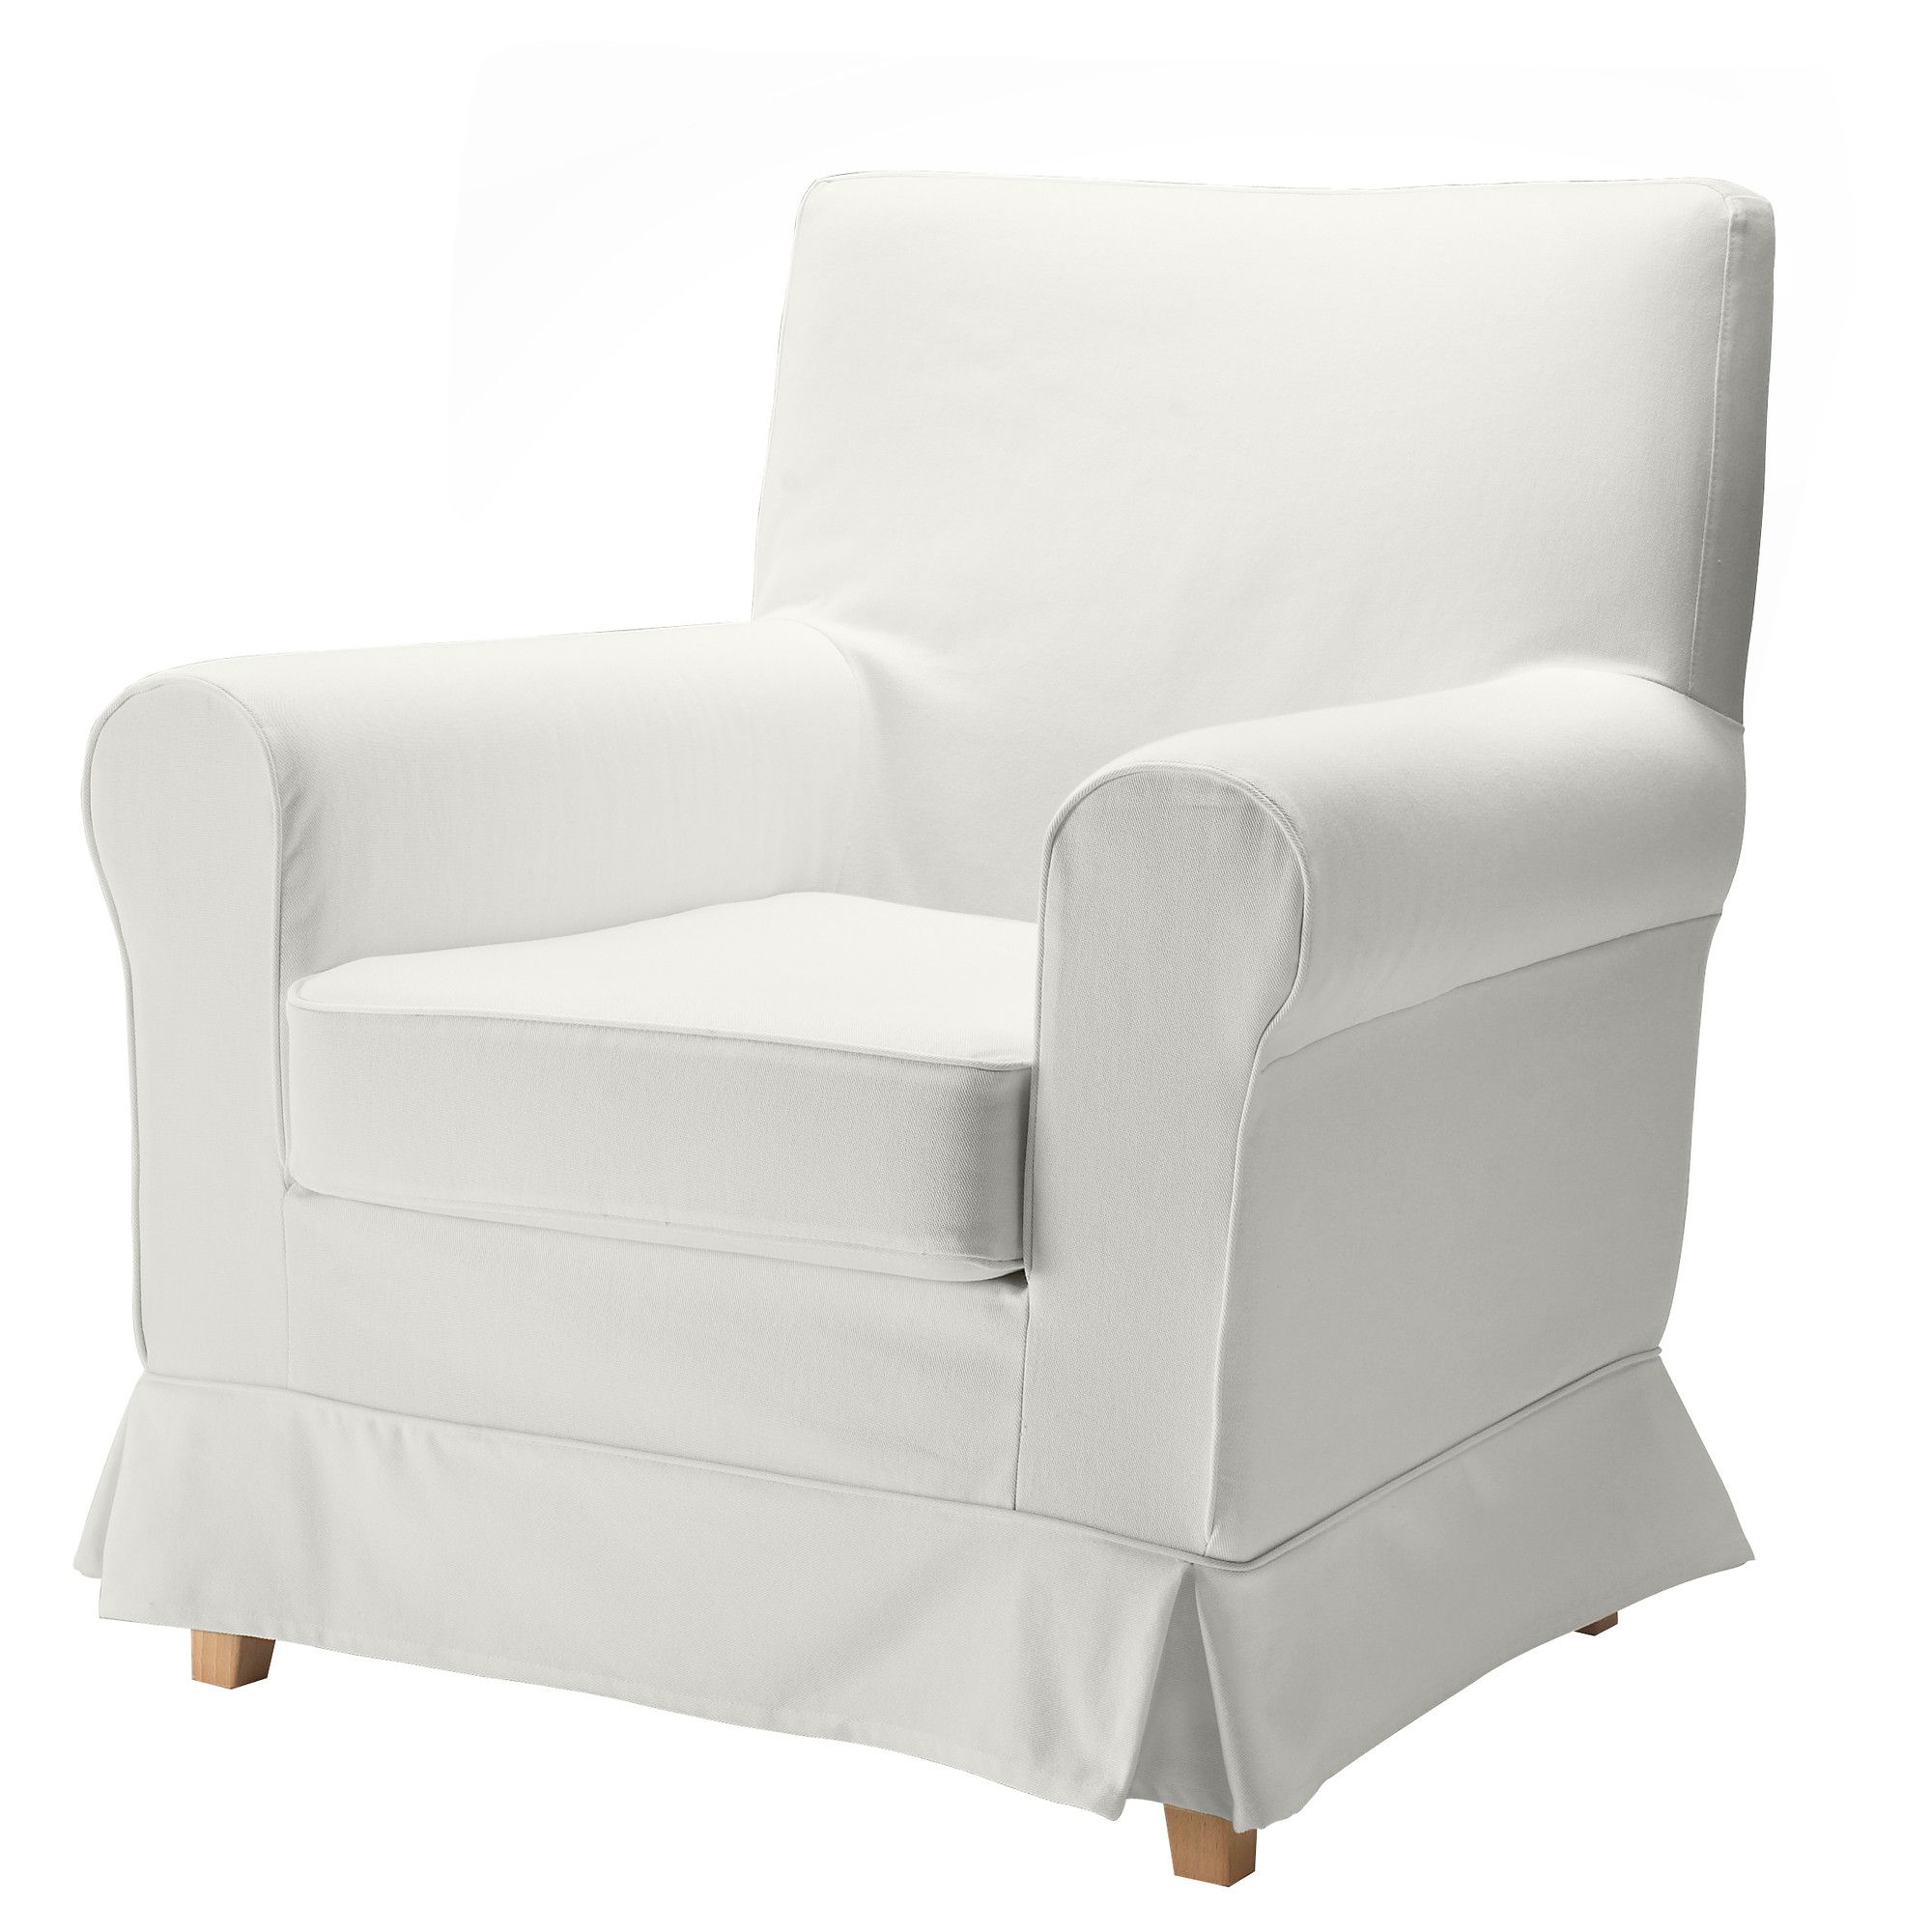 EKTORP JENNYLUND Chair Blekinge white IKEA $200 If you end up